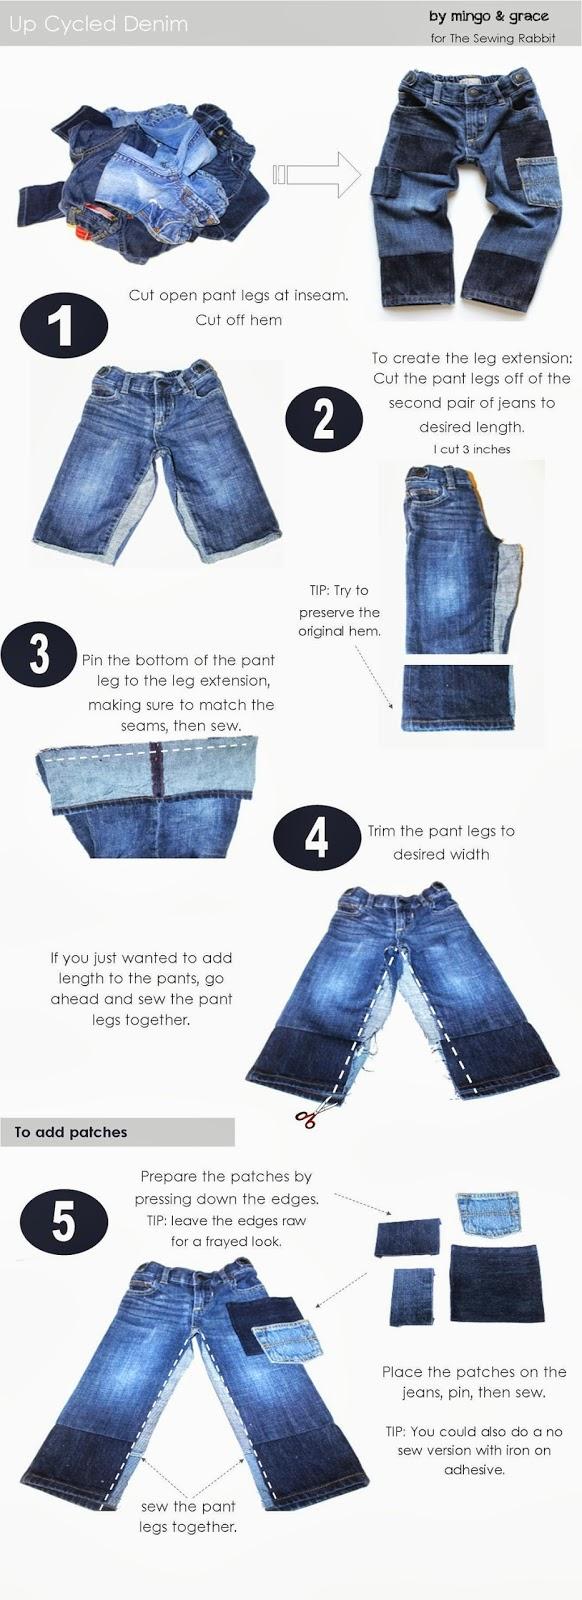 Upcycled Denim DIY - #SewingRabbitFallCollection - Mingo & Grace